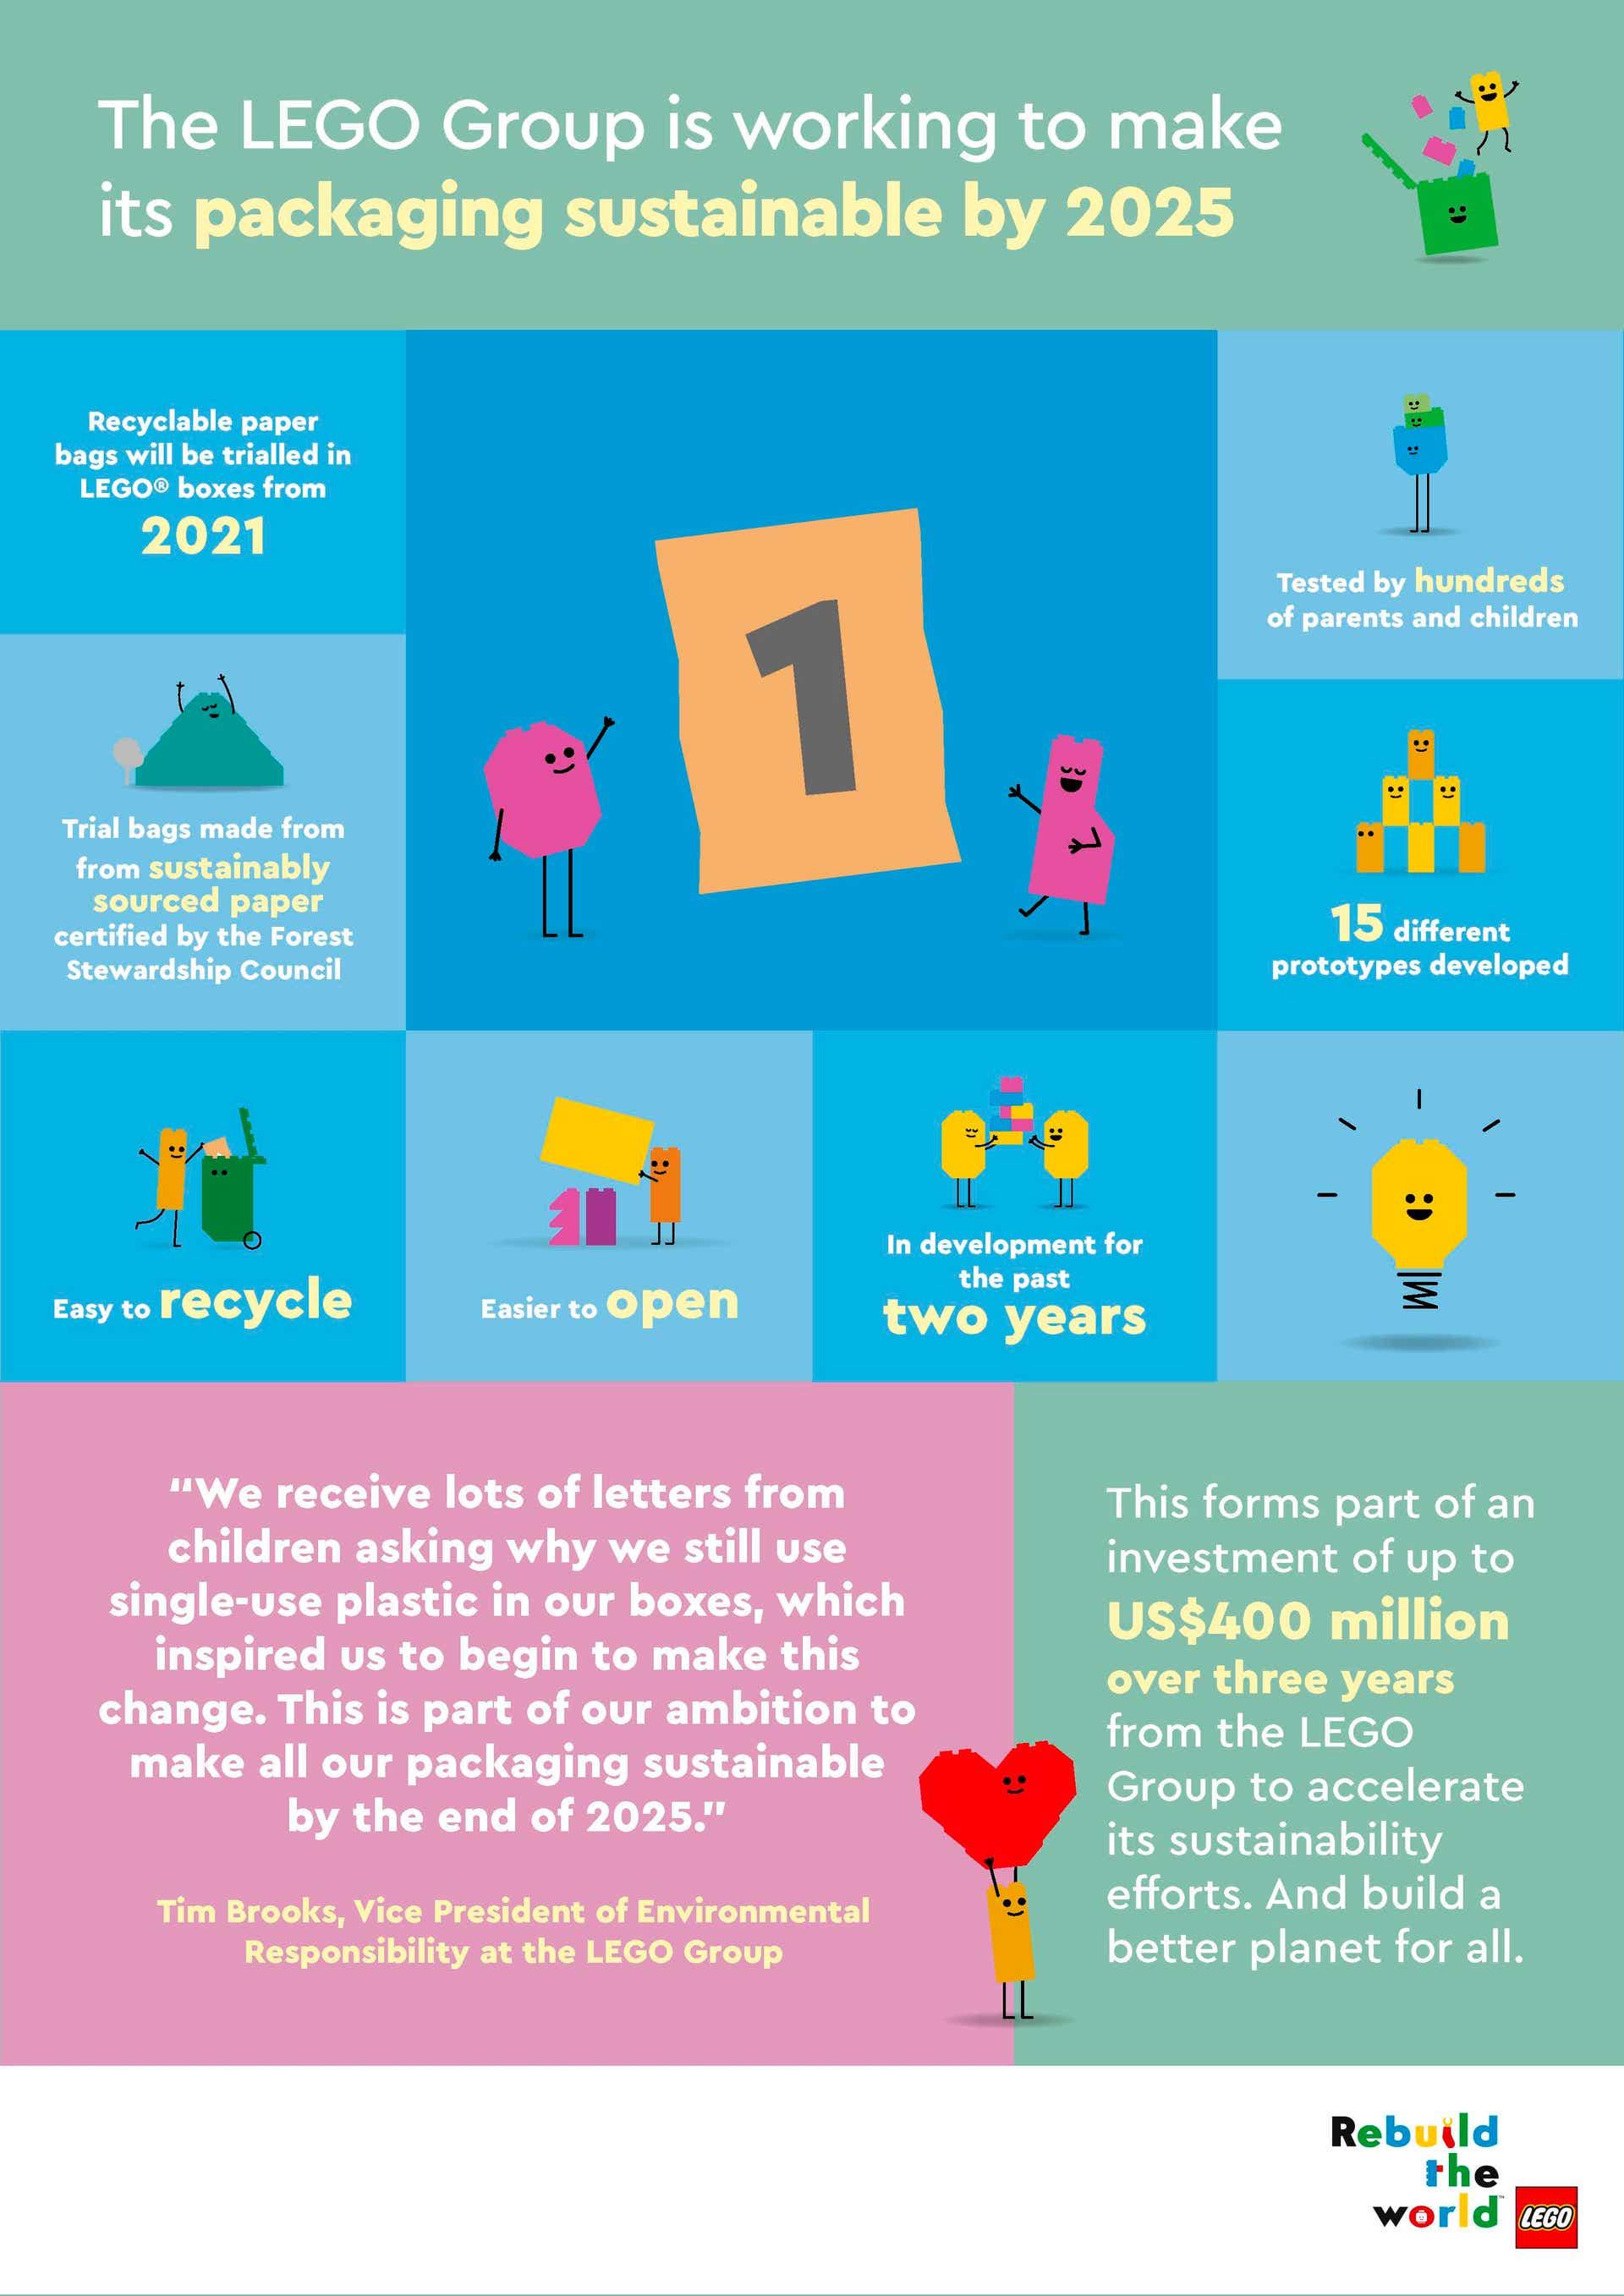 lego, rebuild the world, plastic, duurzaam, recyclebaar, 2021, 2025, 2030